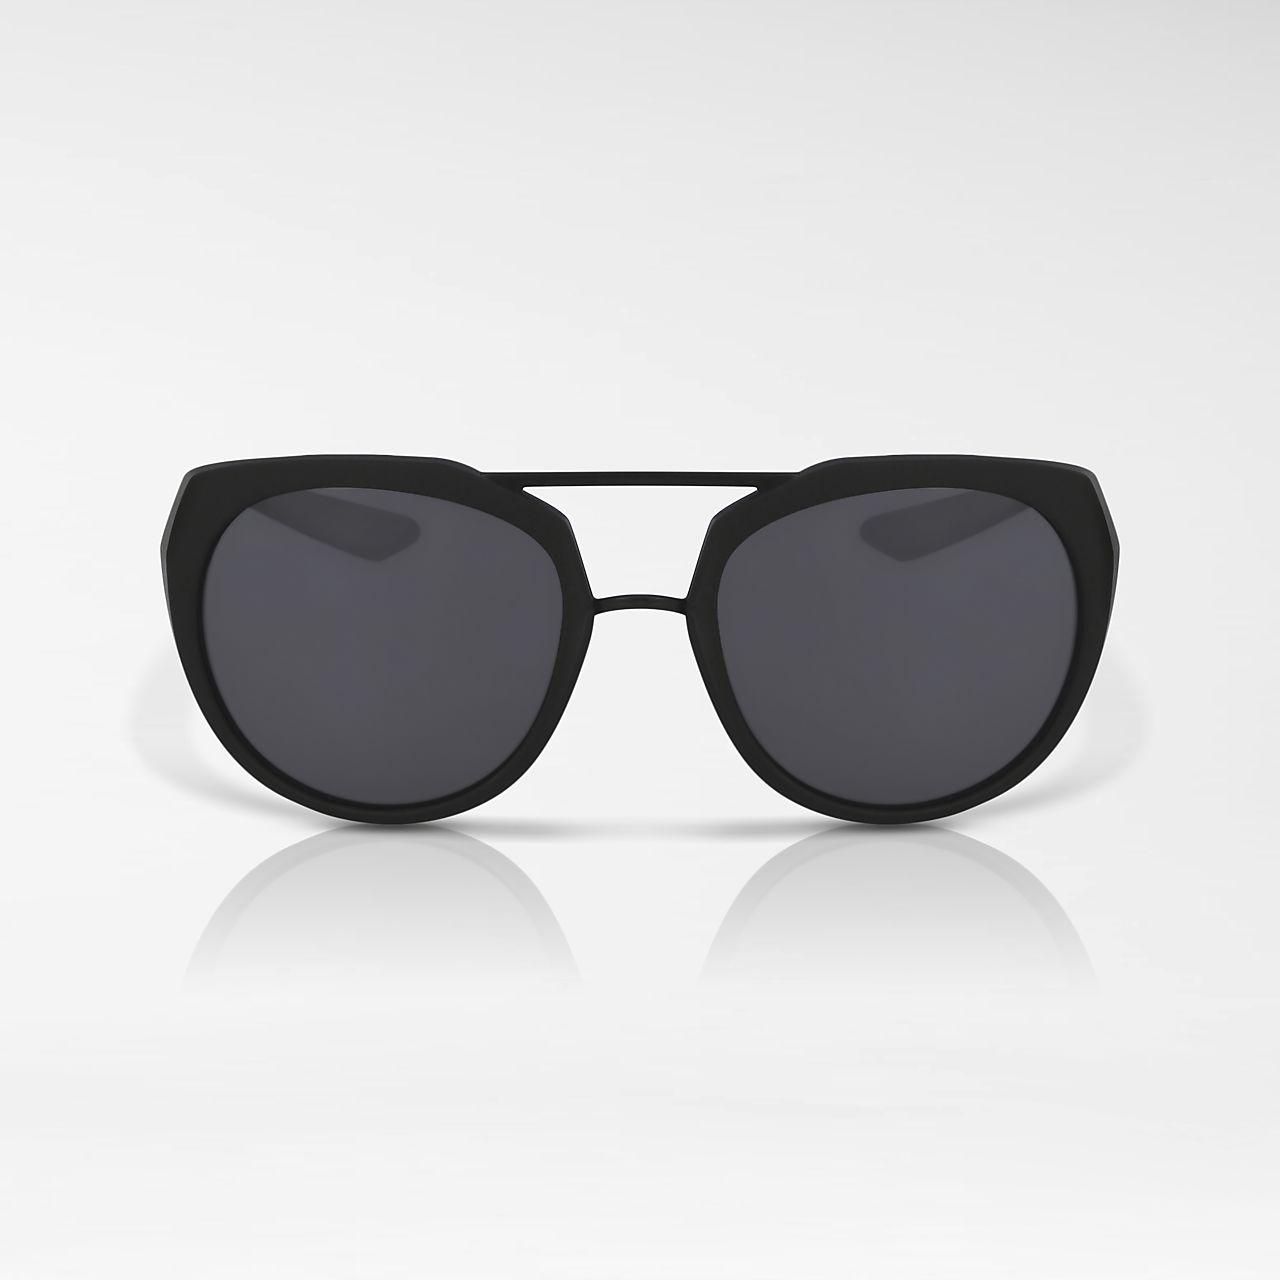 Low Resolution Nike Flex Motion Mirrored Sunglasses Nike Flex Motion  Mirrored Sunglasses